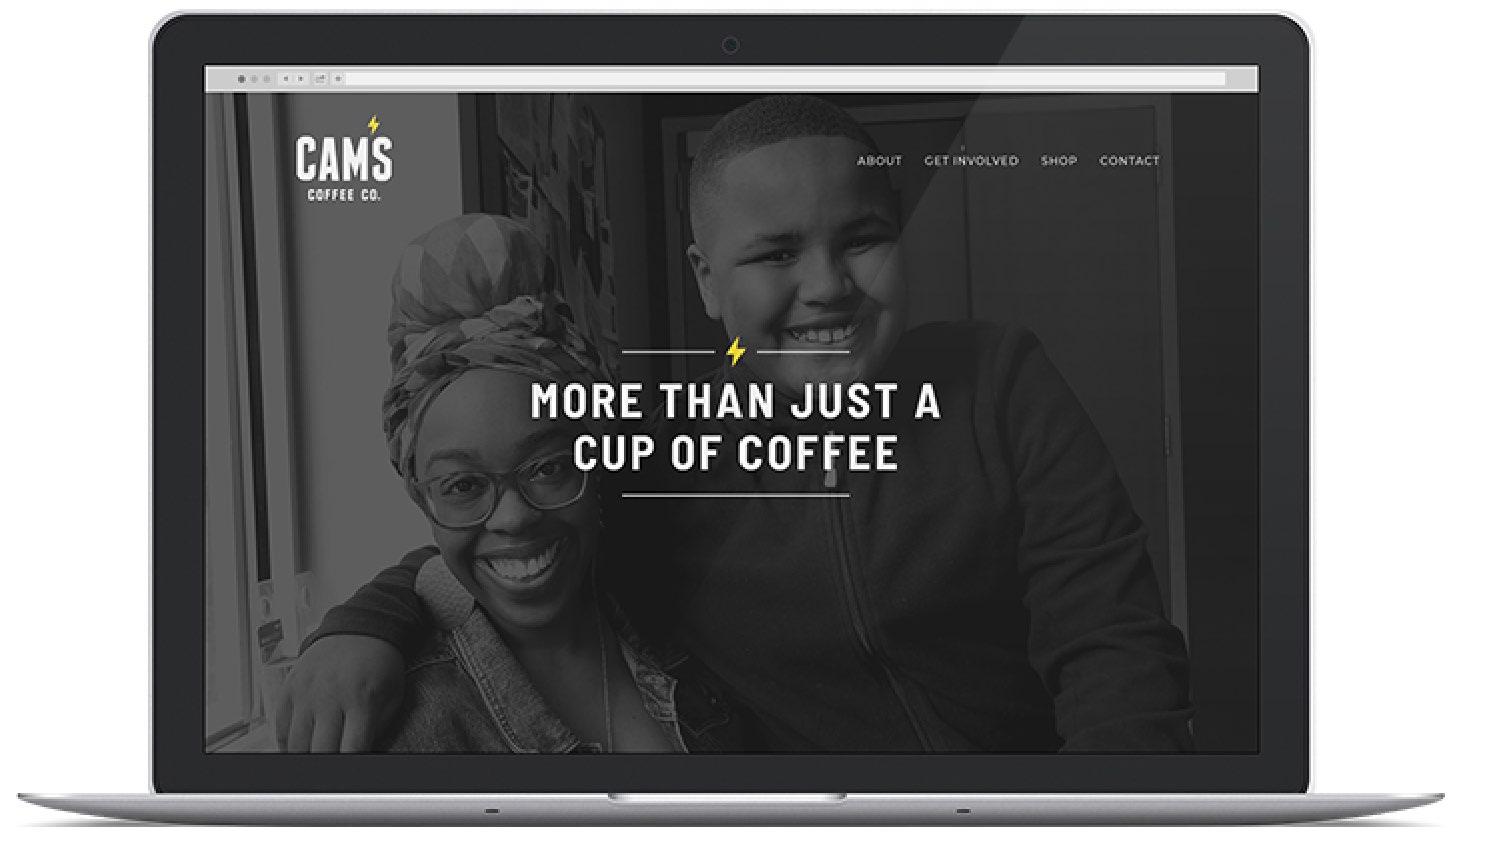 Cam's website on laptop